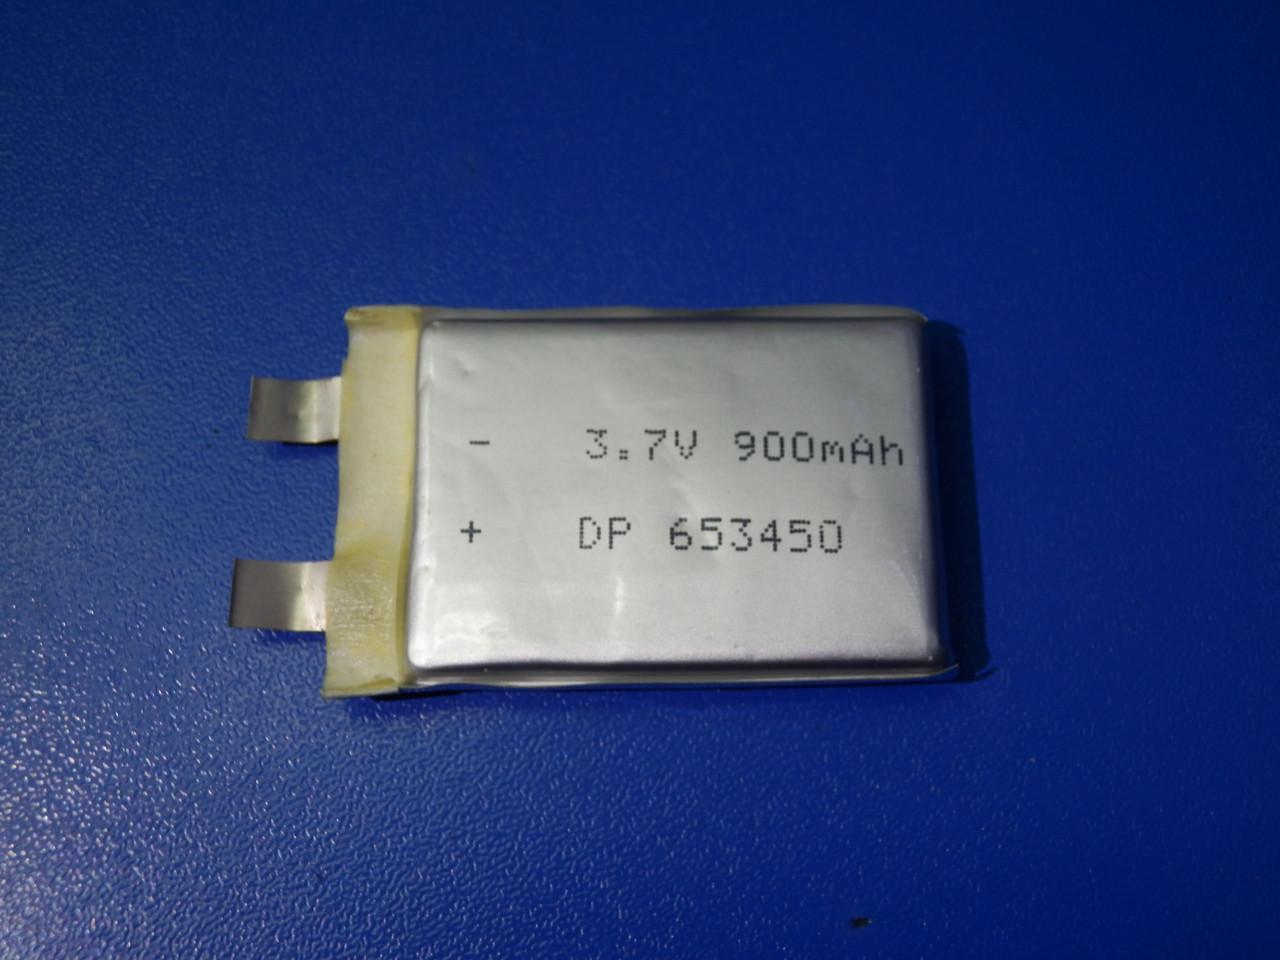 Акумулятор Li-pol DESIRE 653450 3,7 v 900mAh-15С